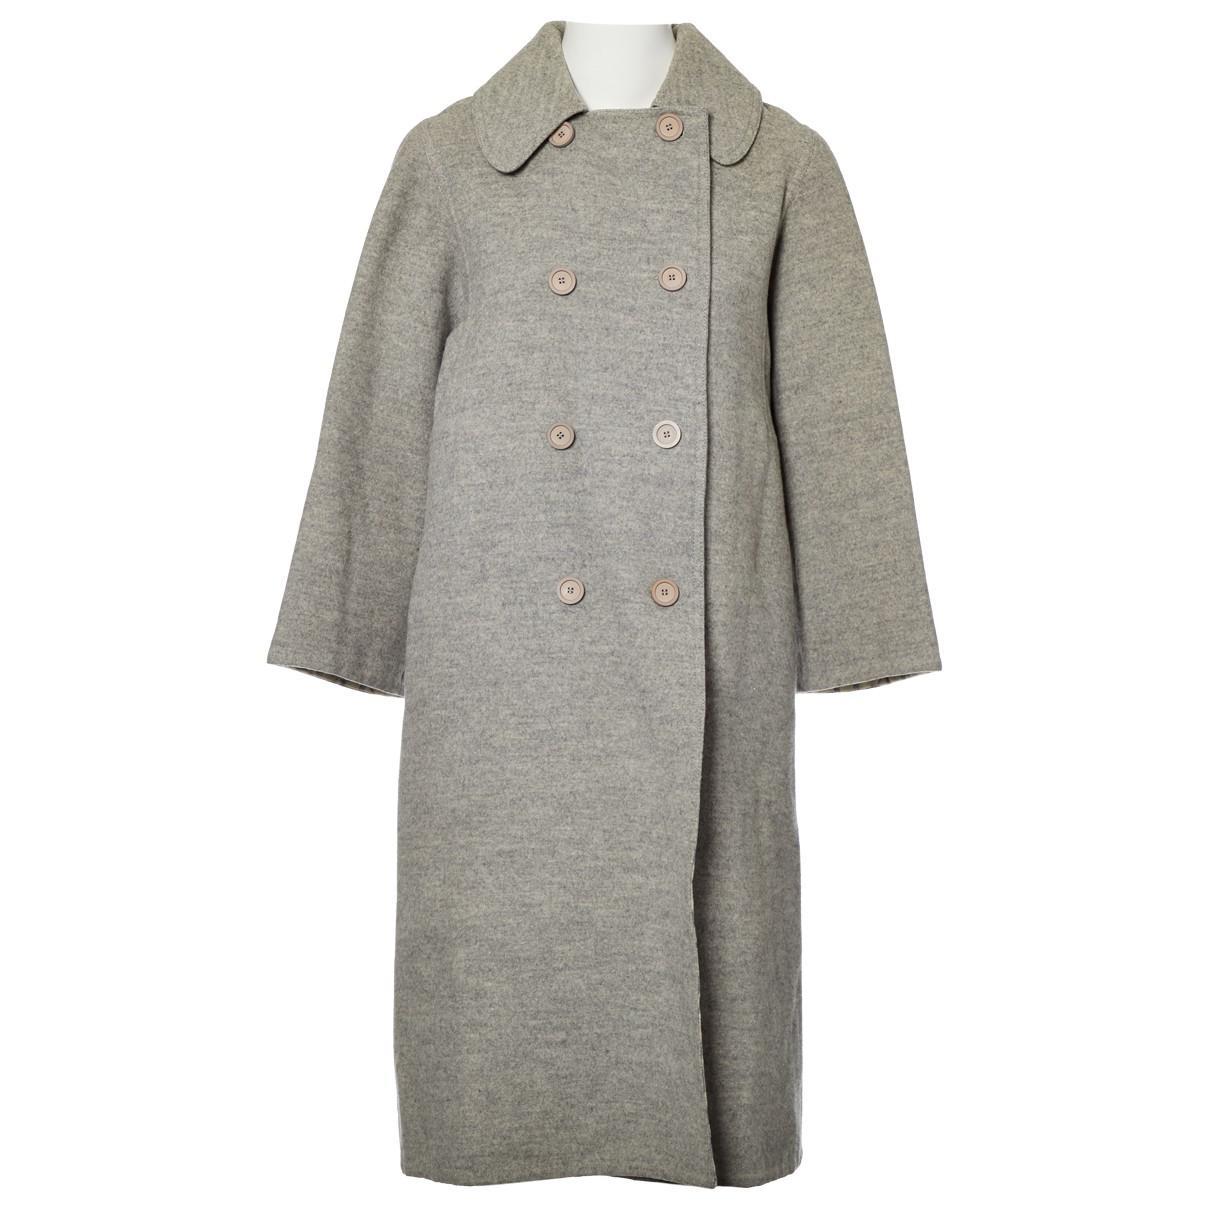 Lyst - Hermès Wool Coat in Gray 0f337accf349c